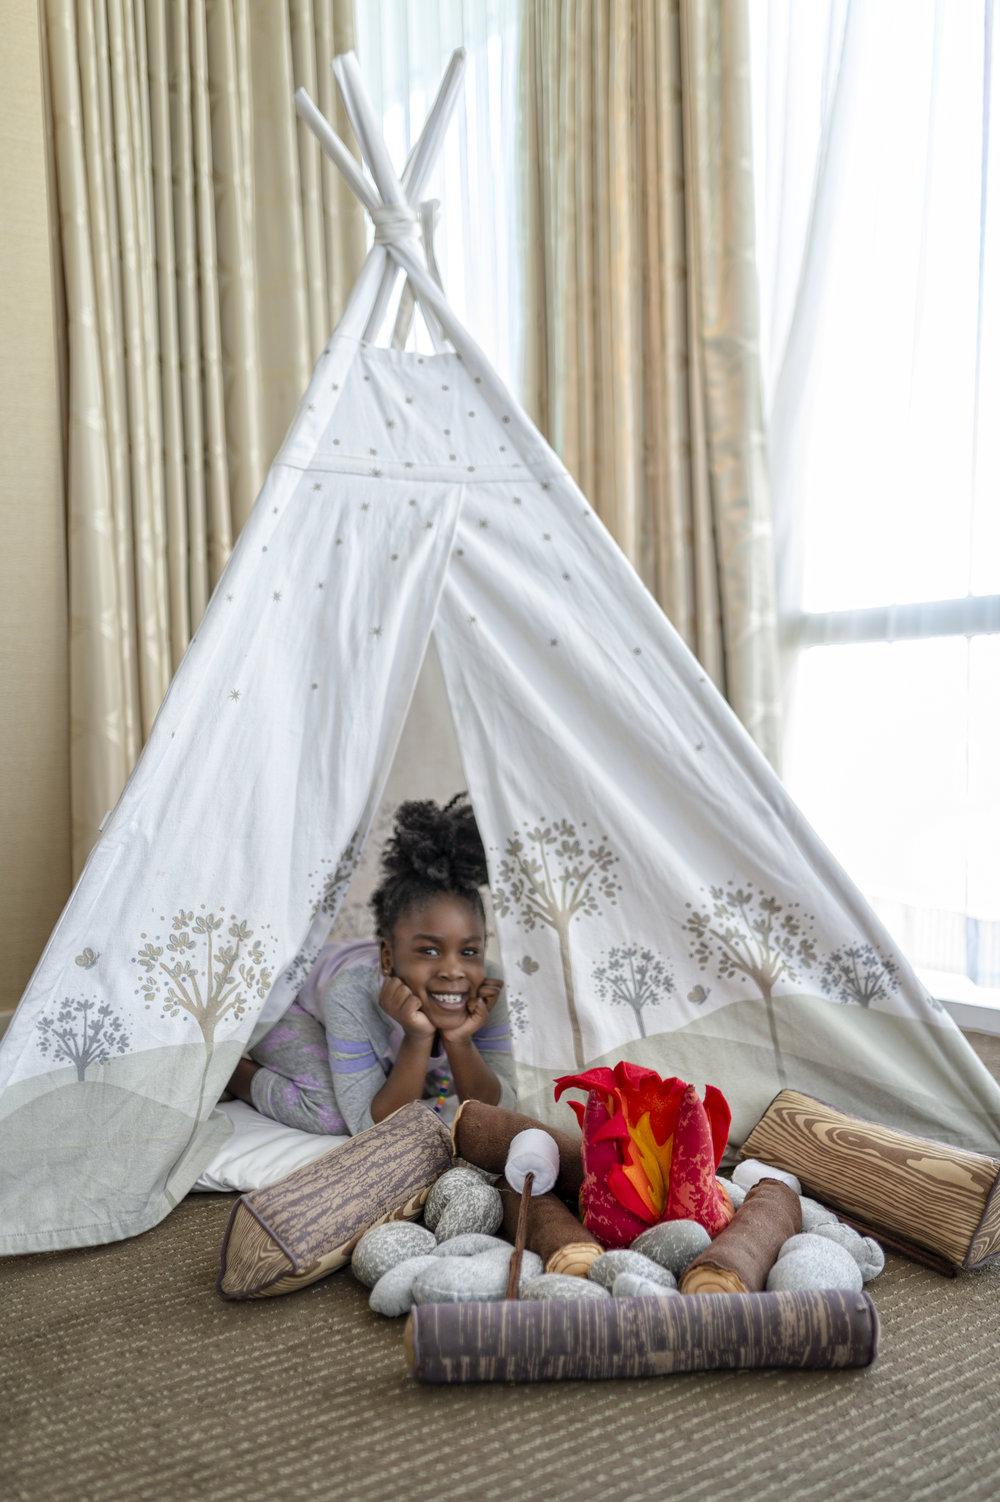 Four-Seasons-Baltimore-Family-Staycation-Kids-ameneties-2.jpg